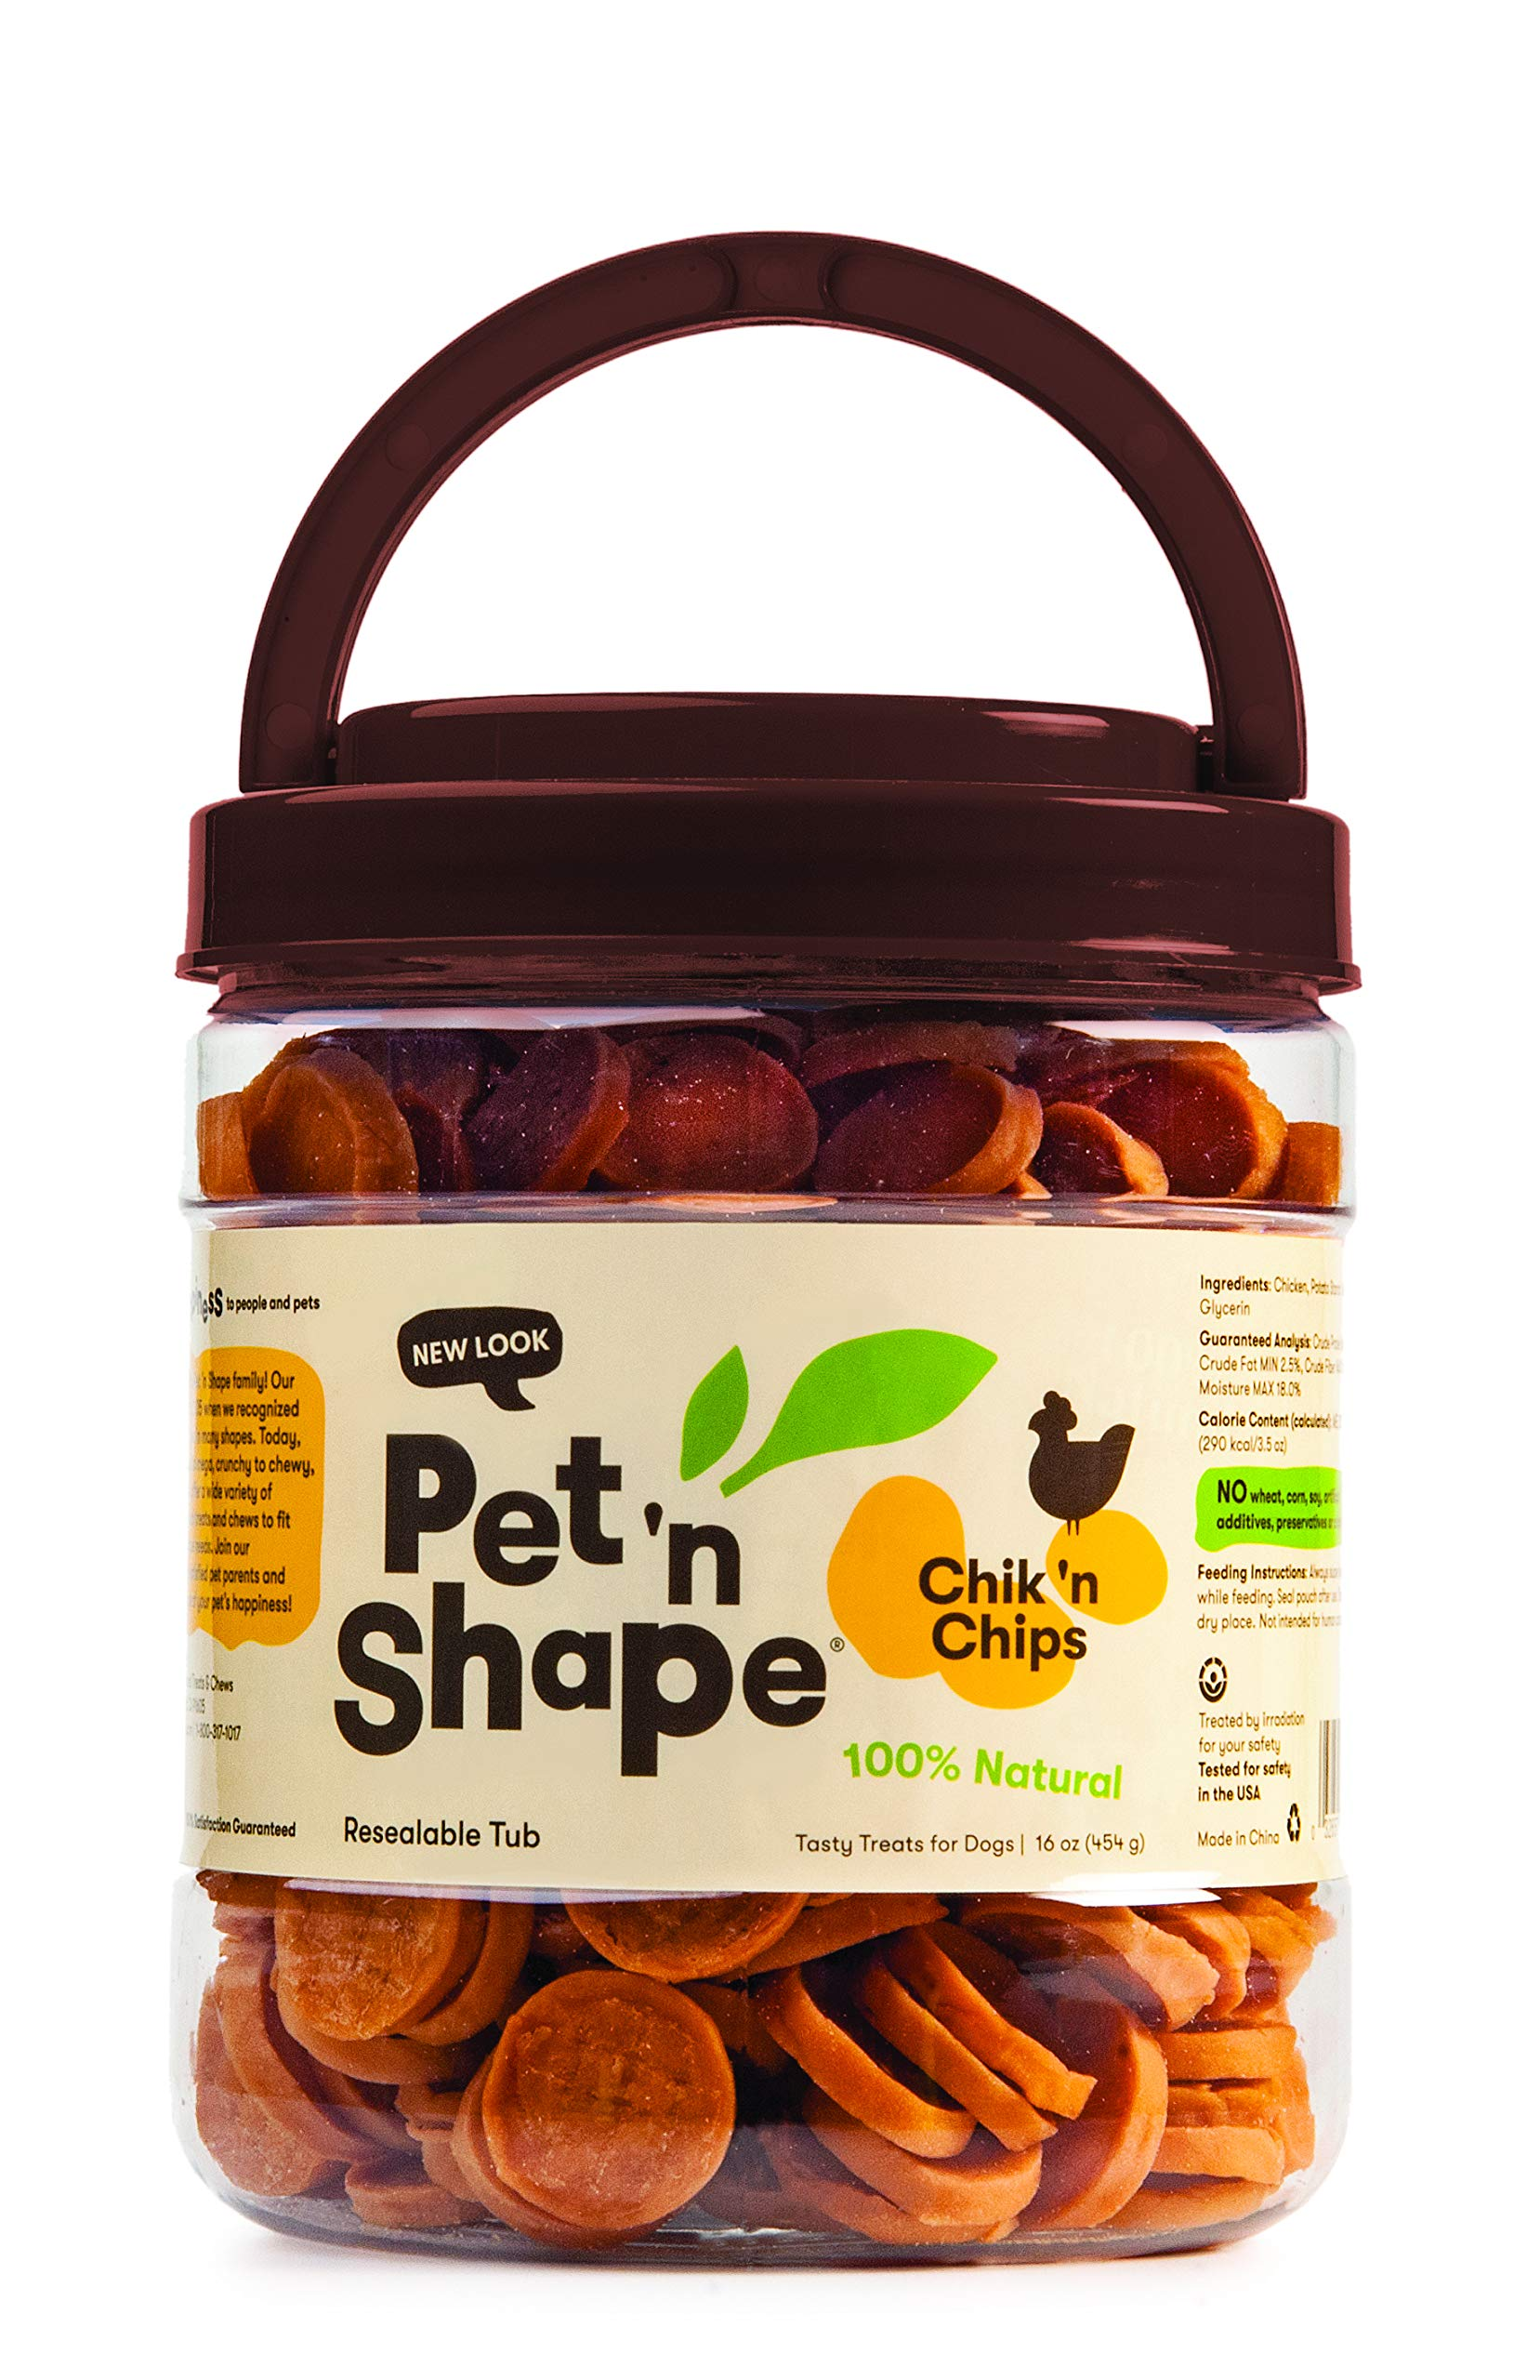 Pet 'n Shape Chik 'n Chips Natural Dog Treats, 1 Pound